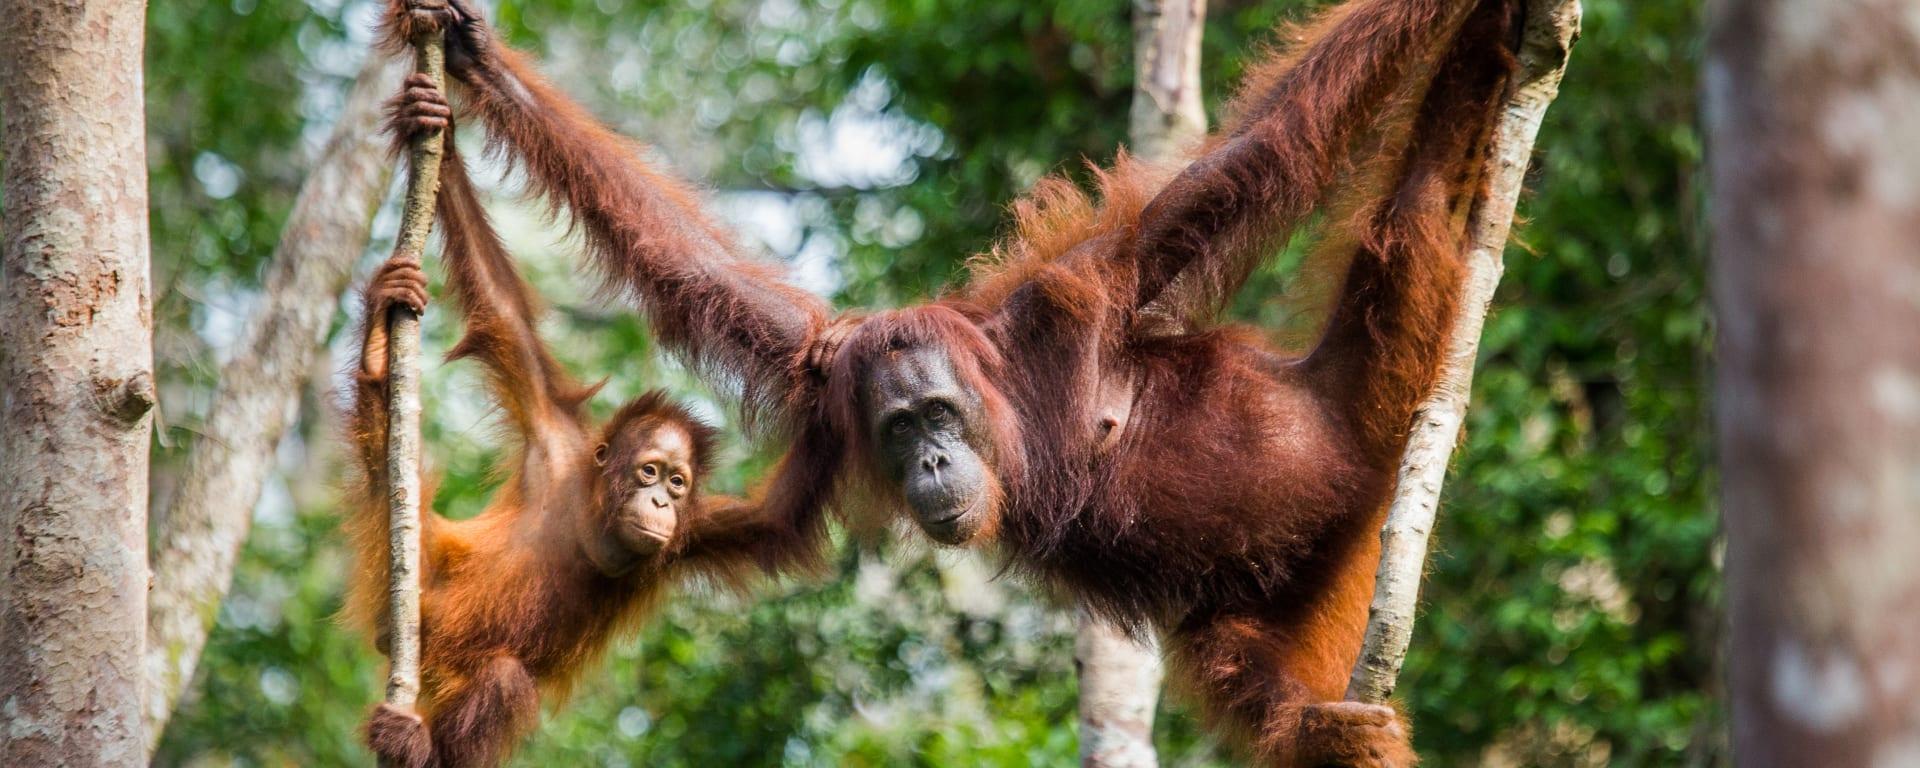 Borneo entdecken mit Tischler Reisen: Malaysia Borneo Orang Utans